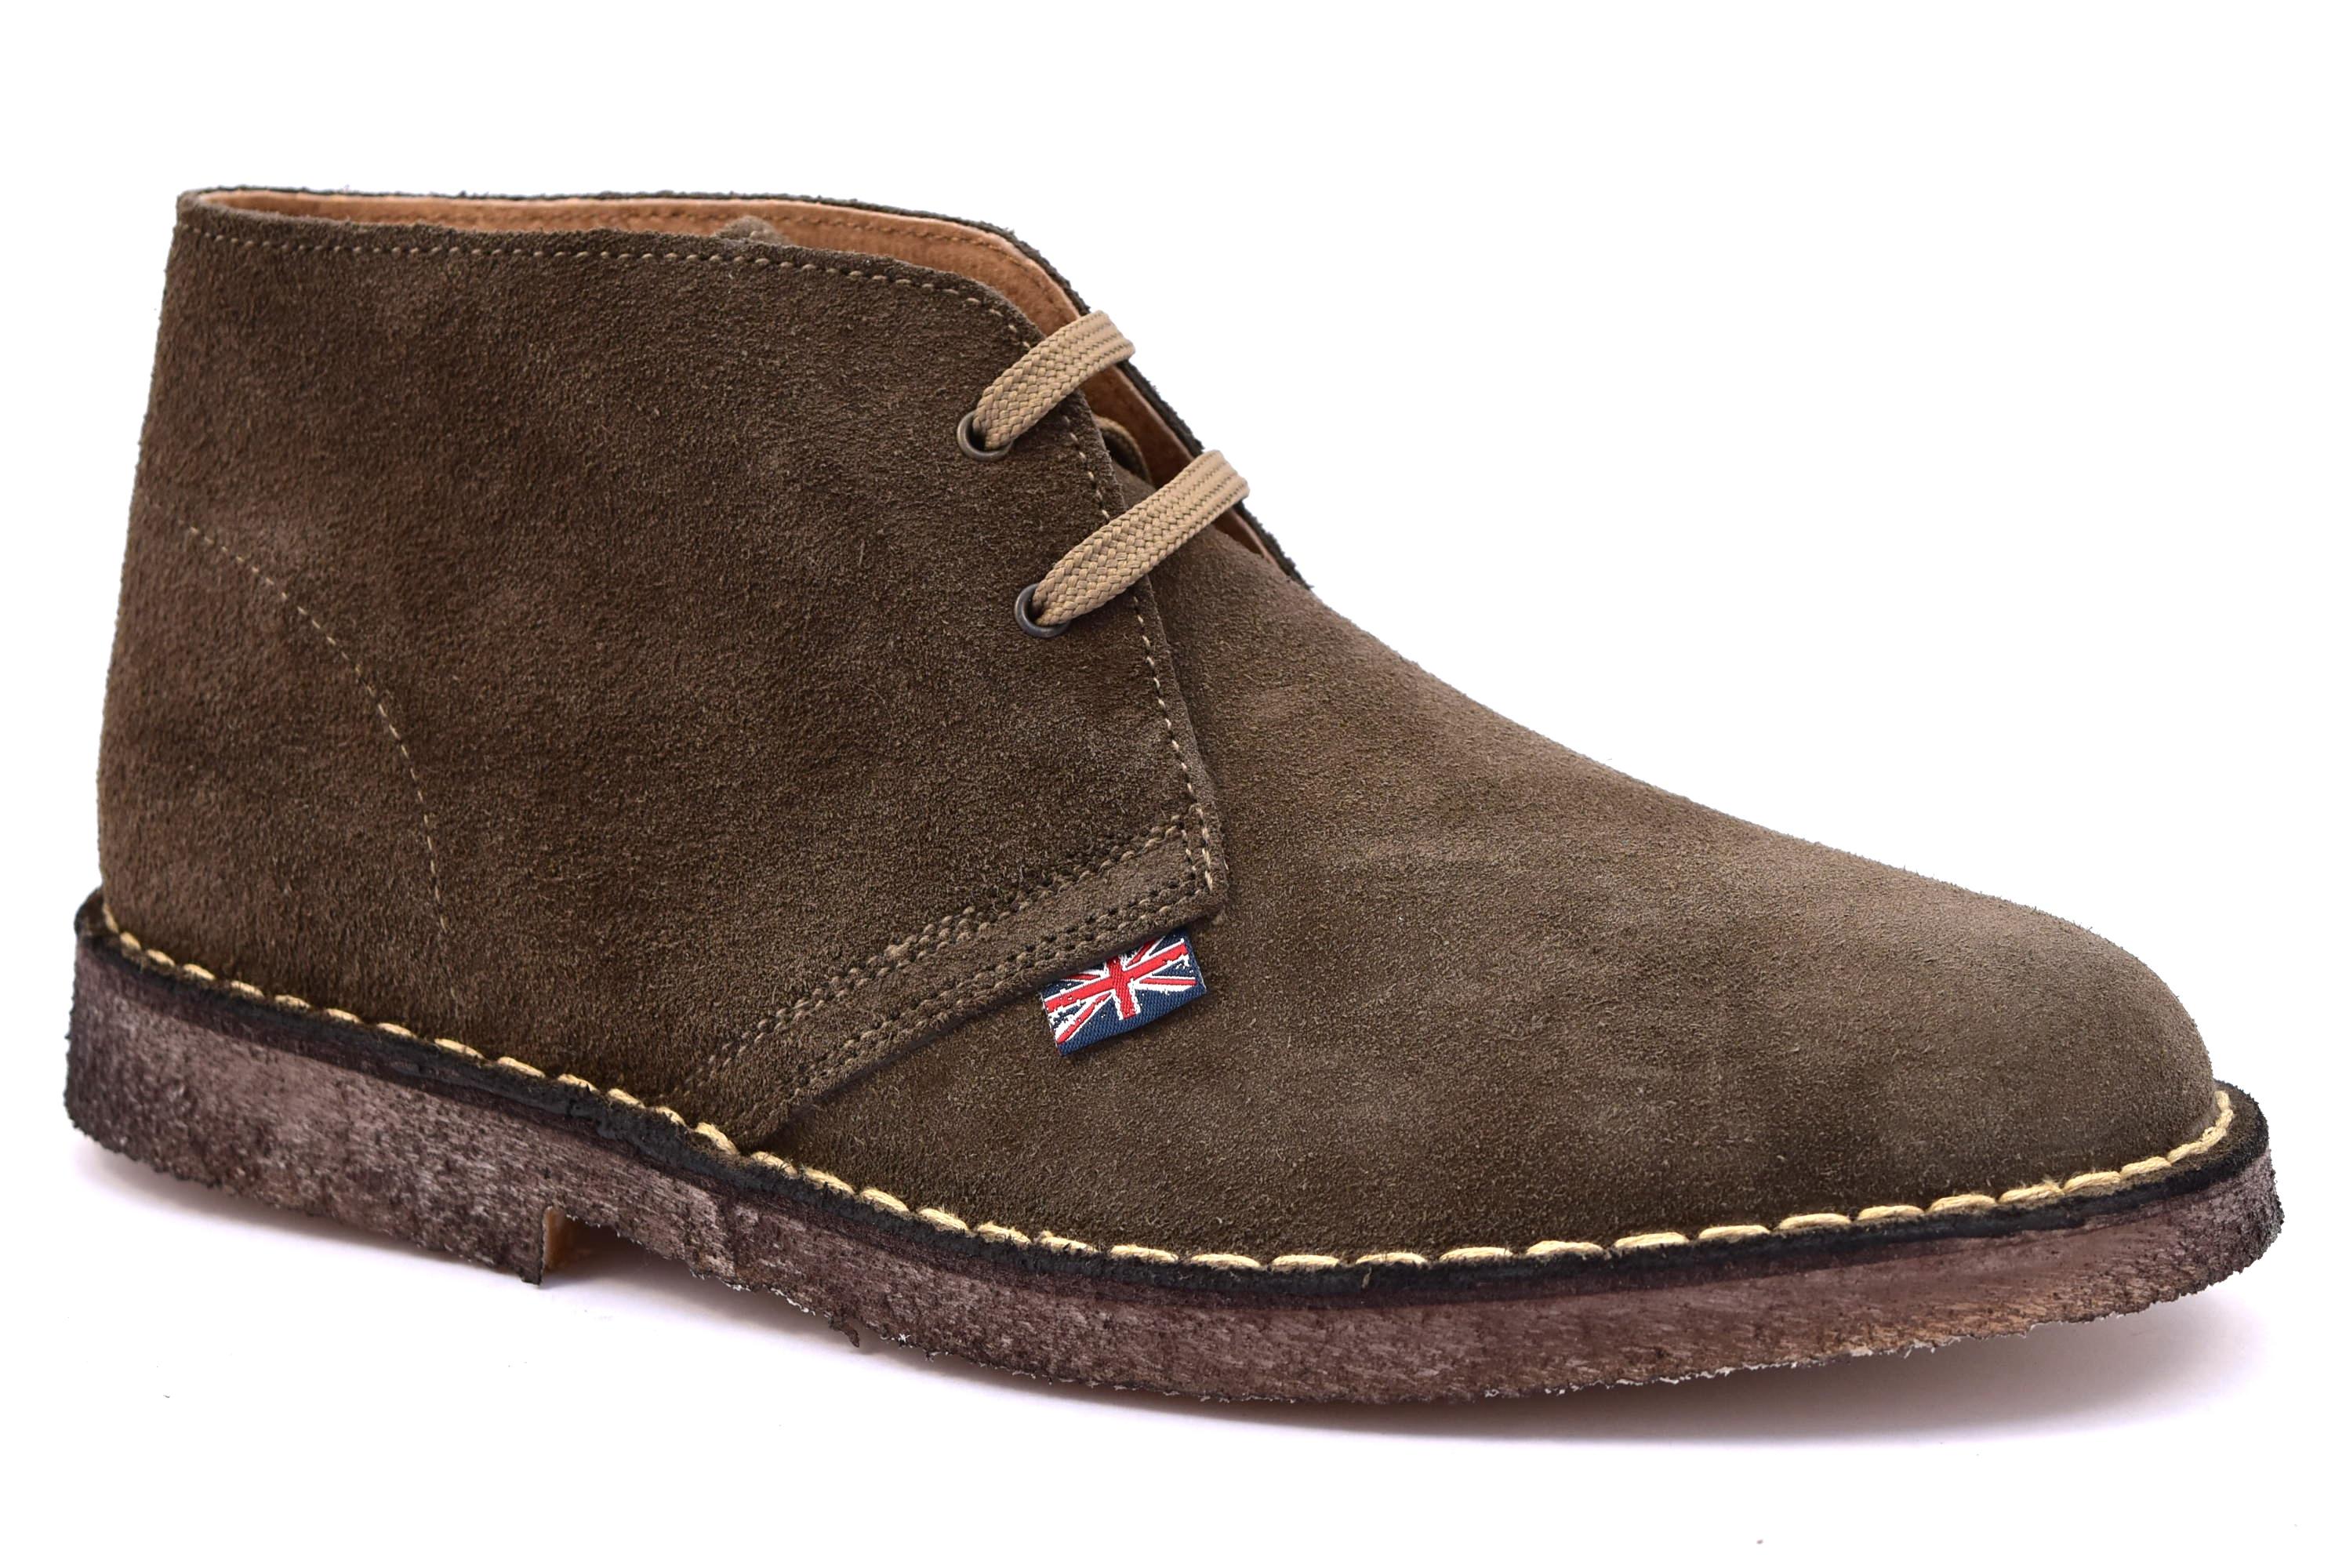 ... SAFARI NATURAL 87000 CARIBU marrone fango scarpe clark desert boot polacchine  uomo stringate scarponcini pedule camoscio ... 81dd271eaa0